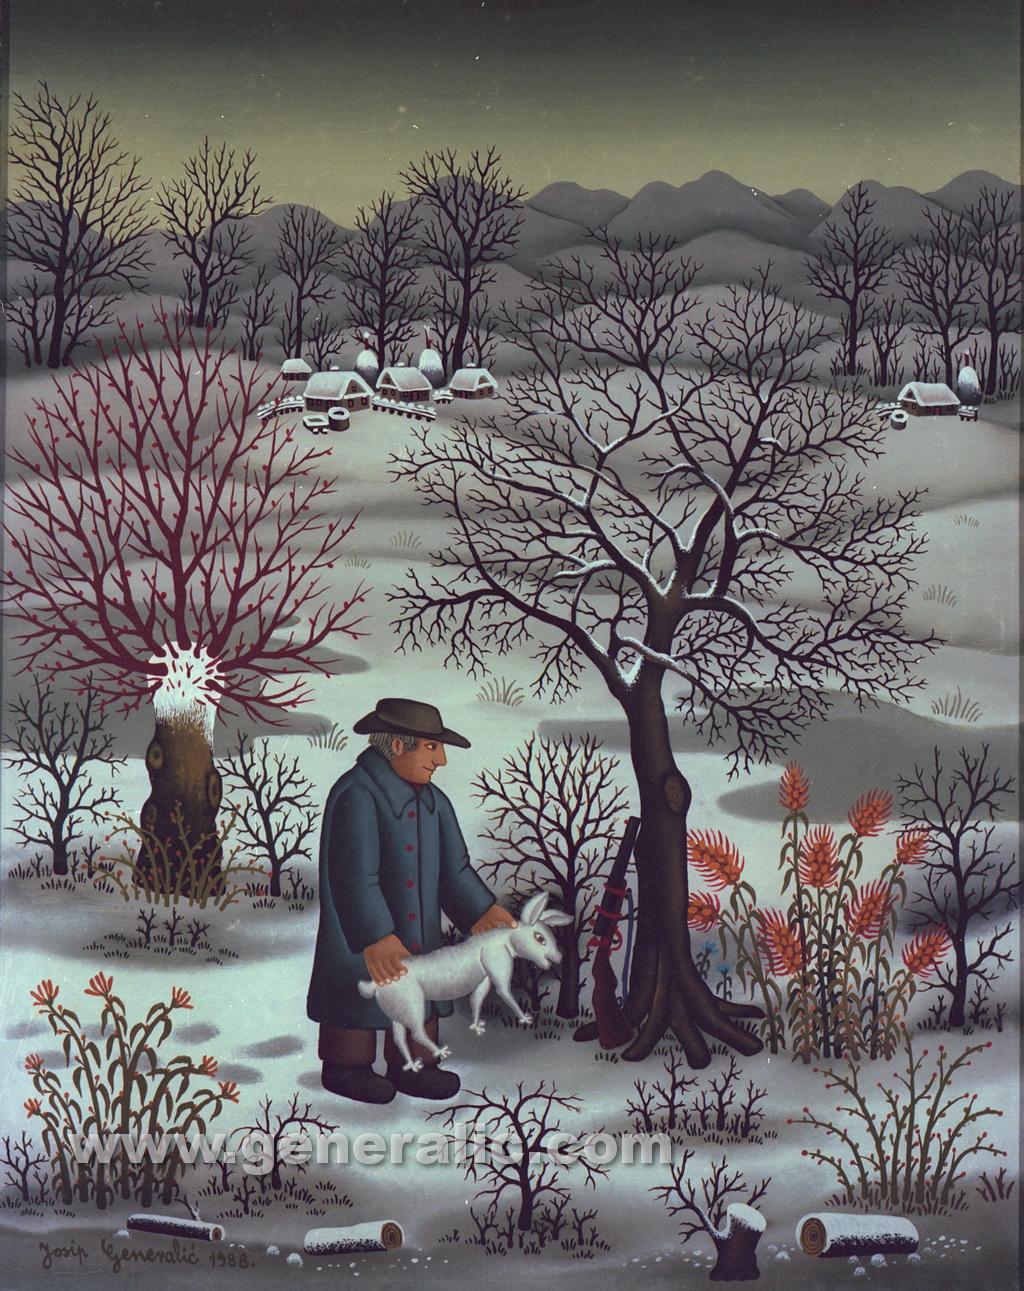 Josip Generalic, 1988, Hunter with a rabbit, oil on glass